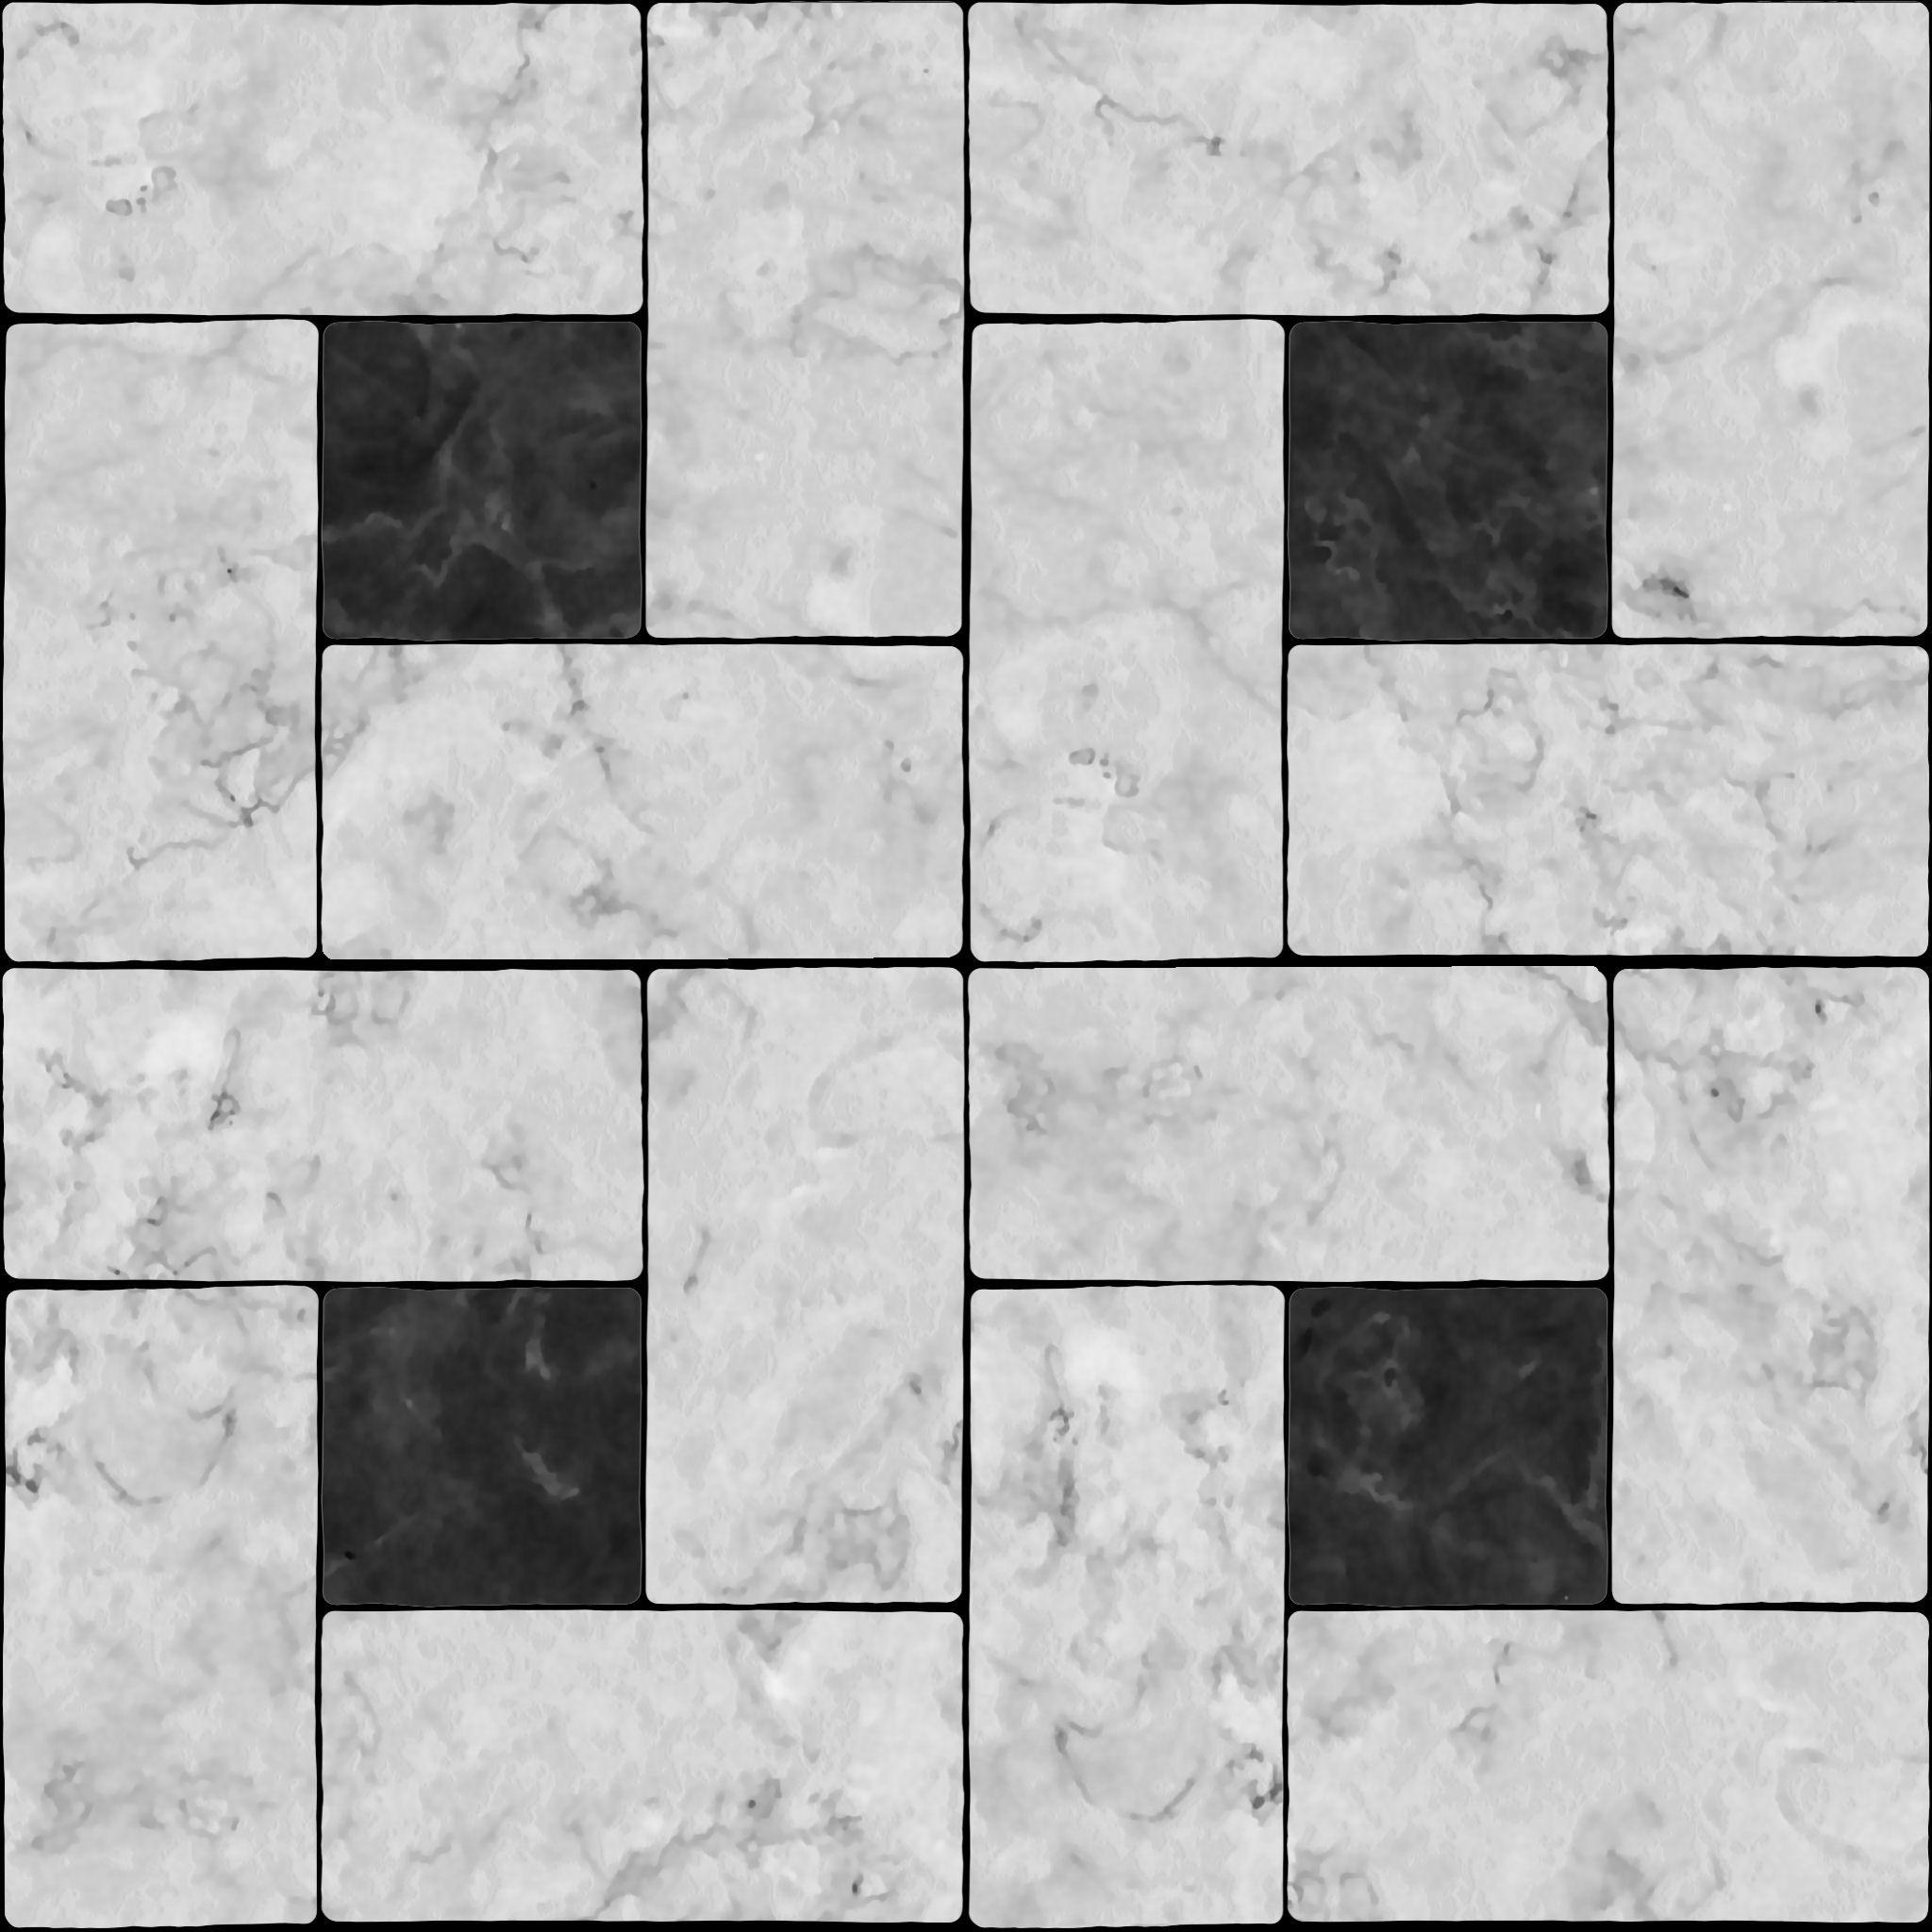 Tile Flooring Texture 2048 x 2048 resolution